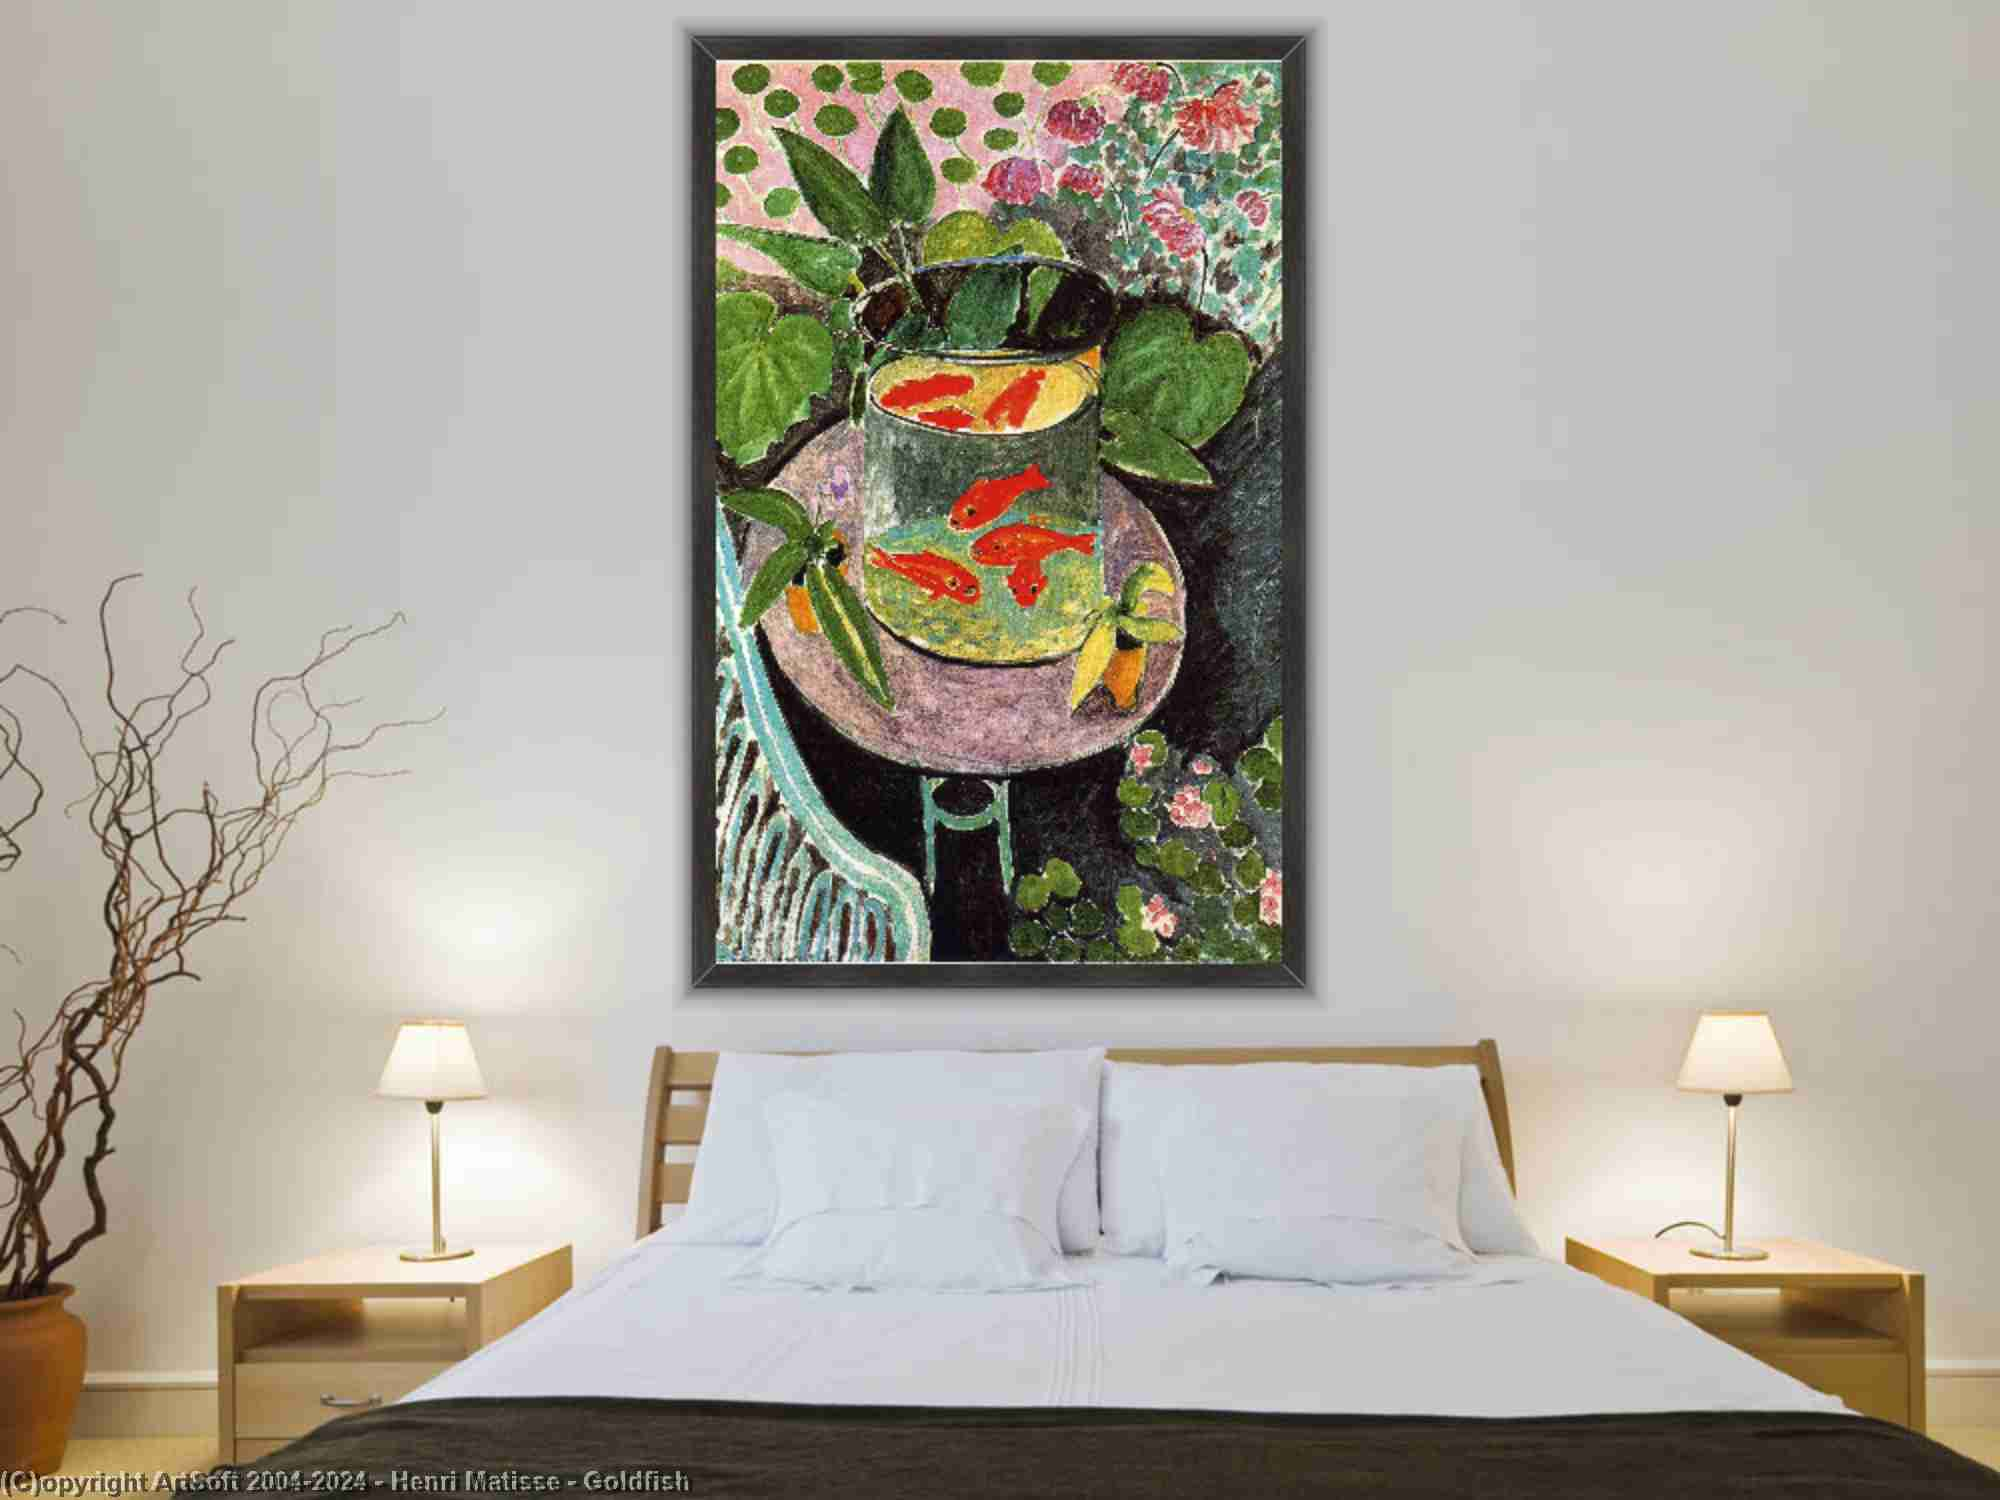 Henri Matisse - Poisson rouge